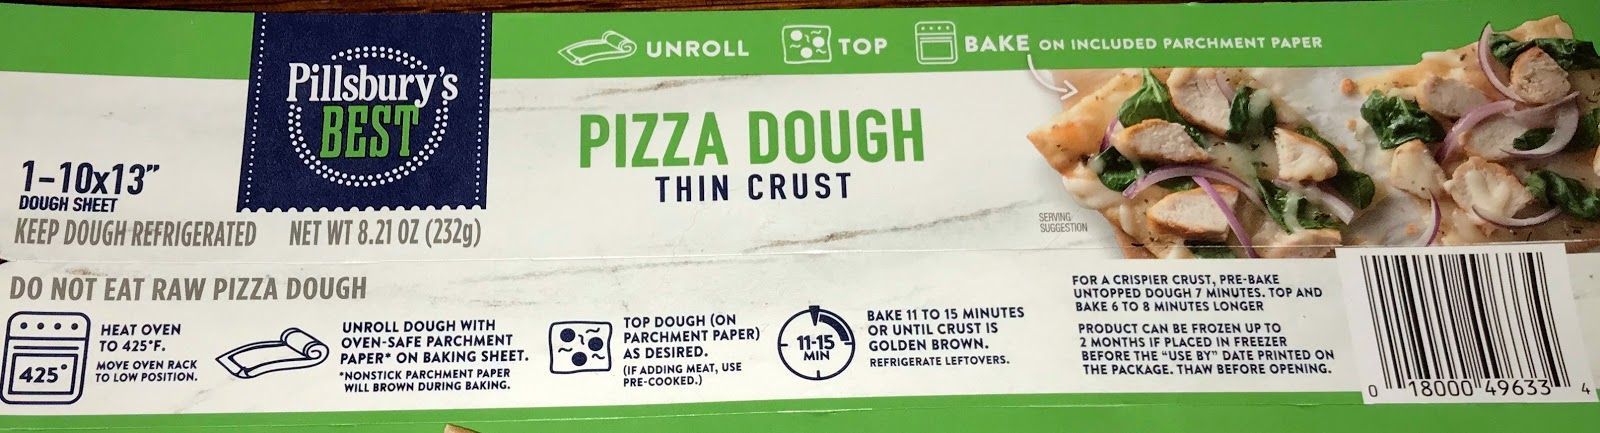 pillsbury thin crust pizza dough instructions